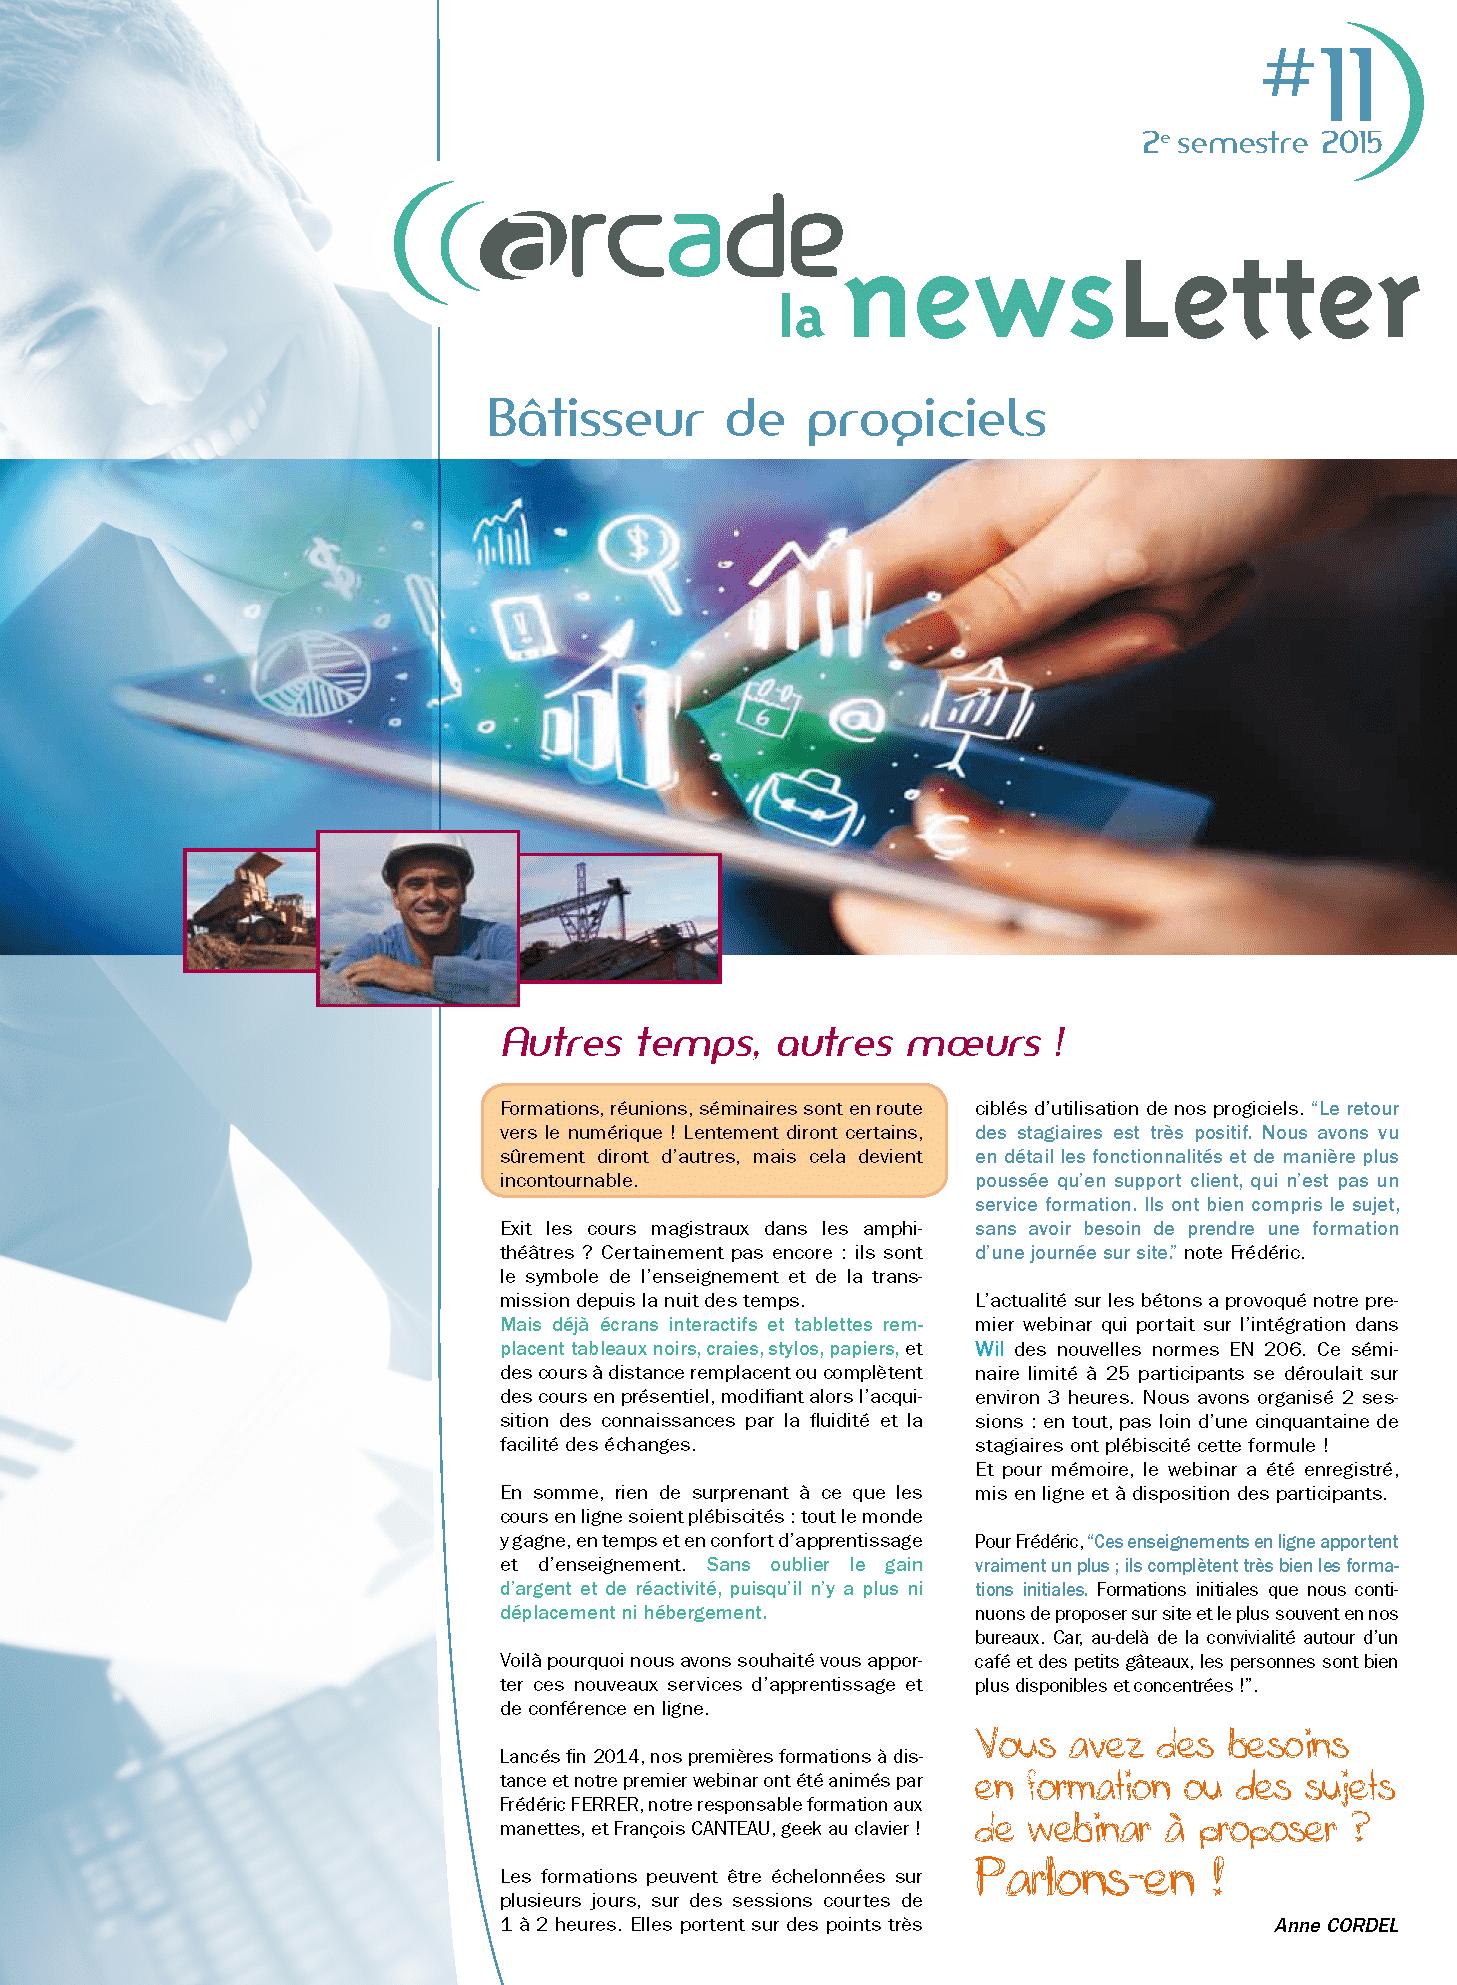 ARCADE_NewsLetter_JUIL15_N11_Page_1